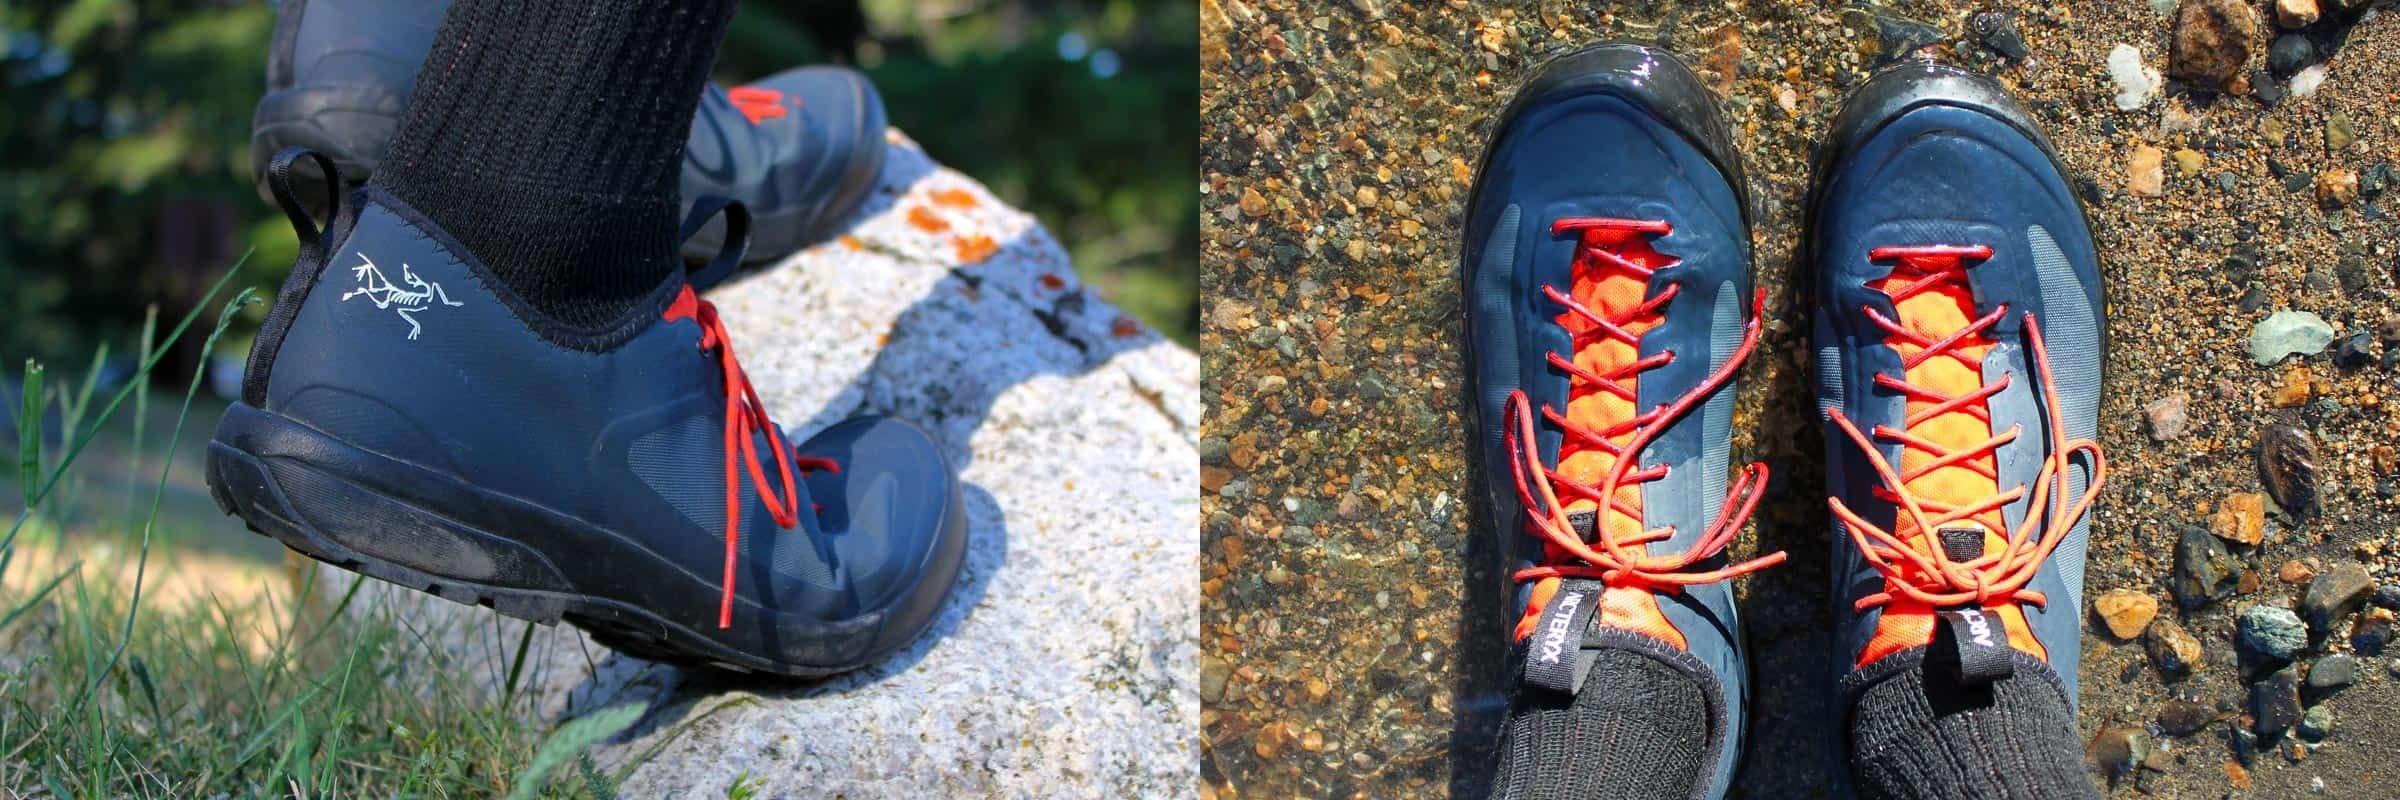 acrux sl gtx shoe